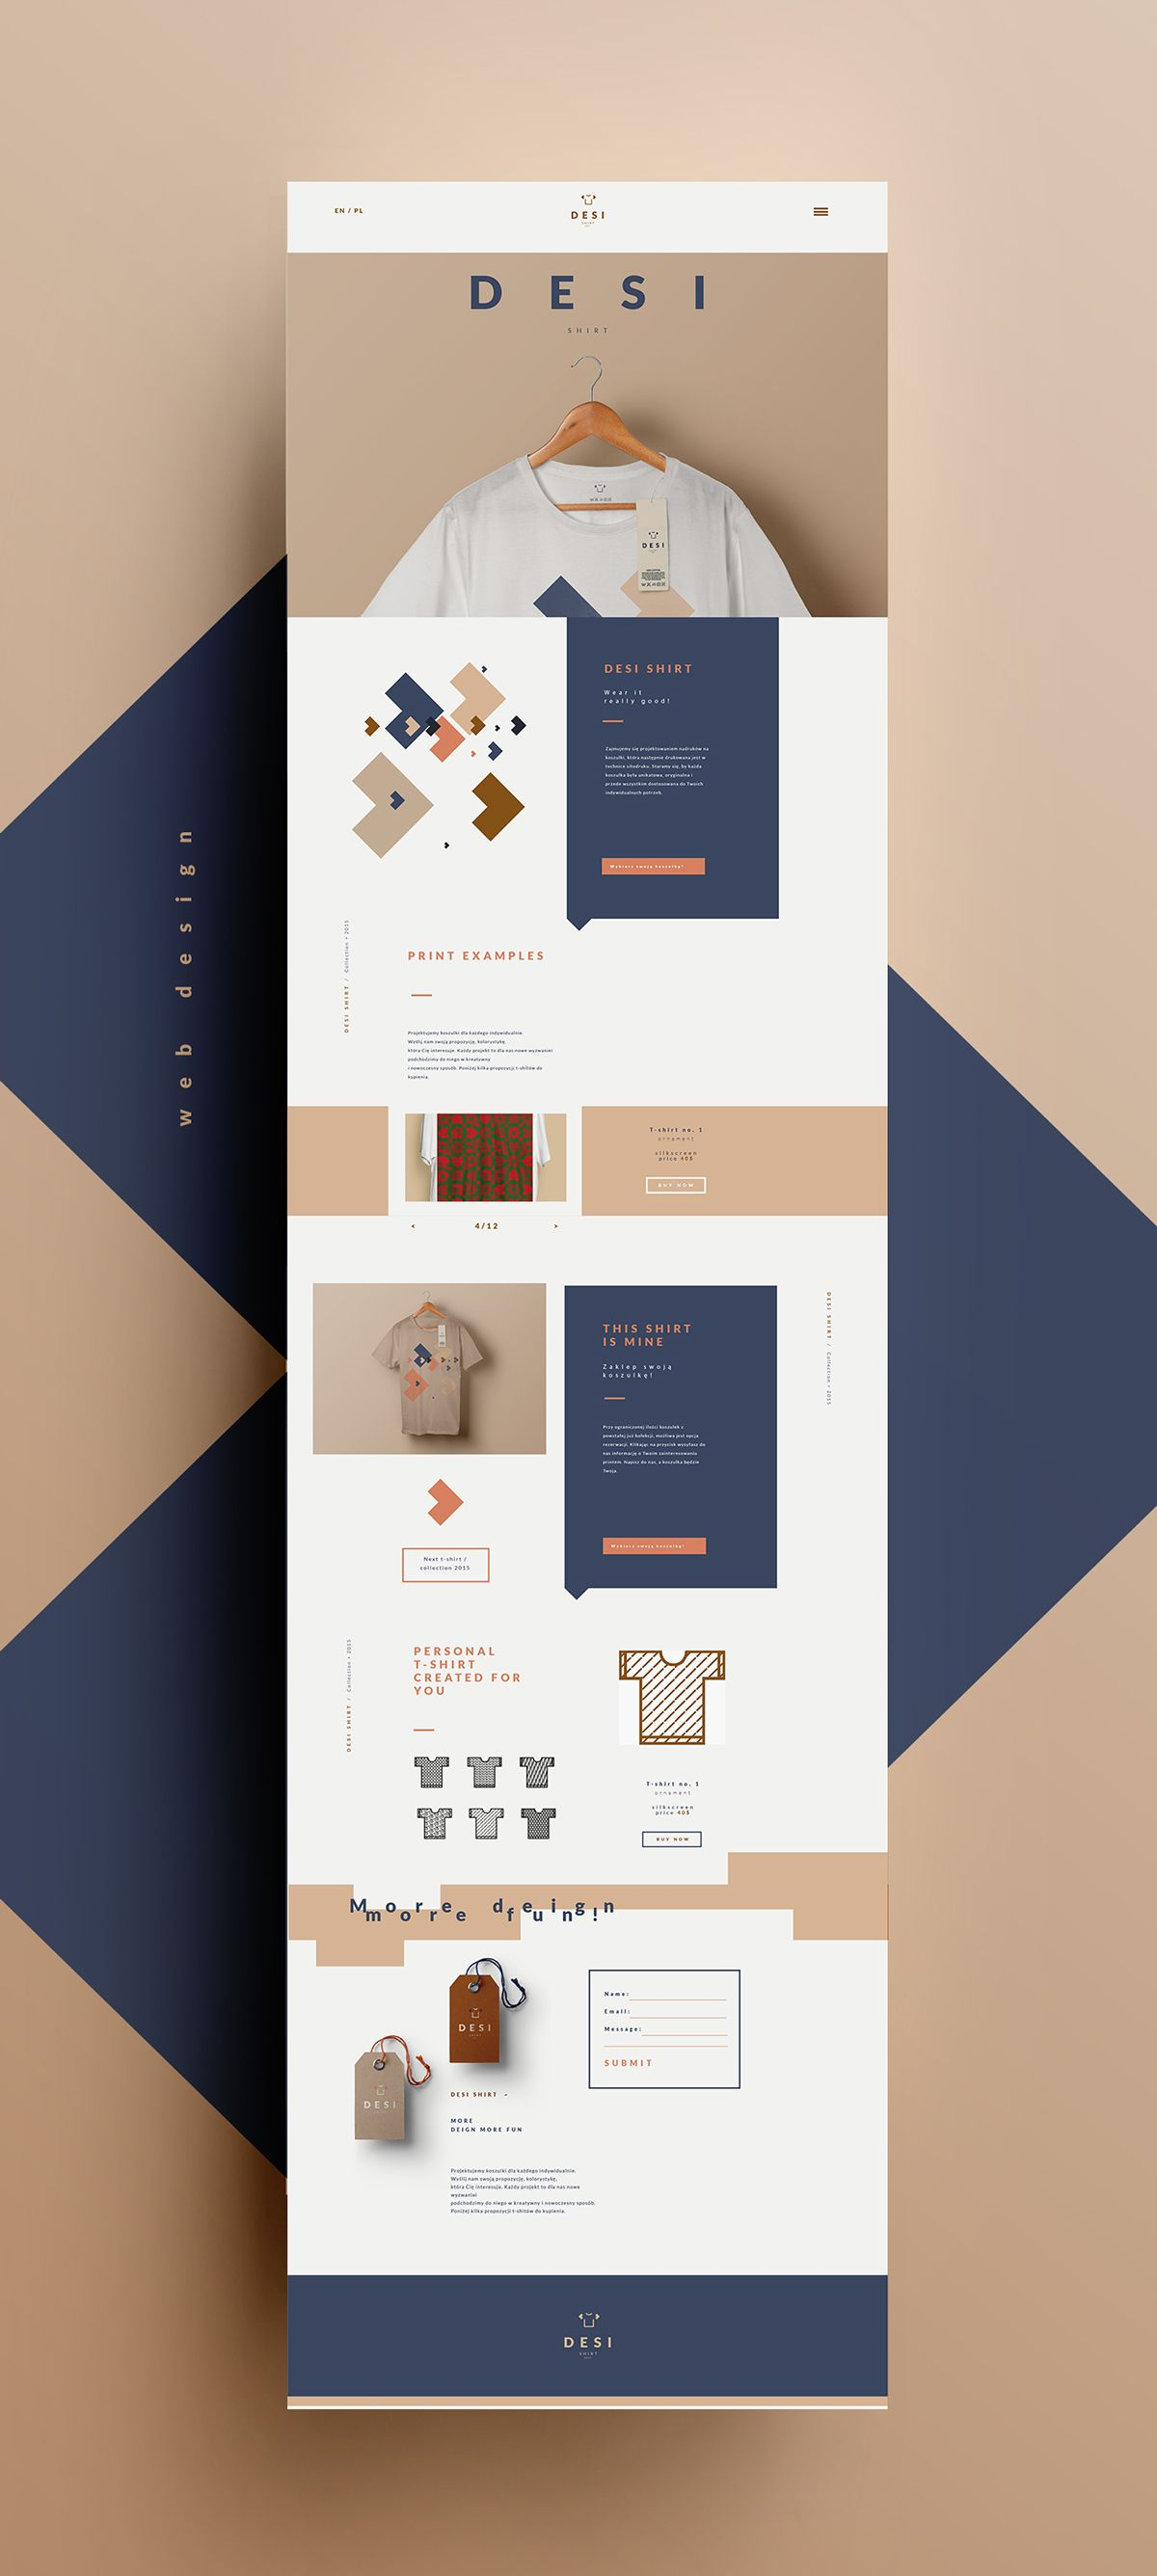 Desi Shirt On Behance Layout Design Web Design